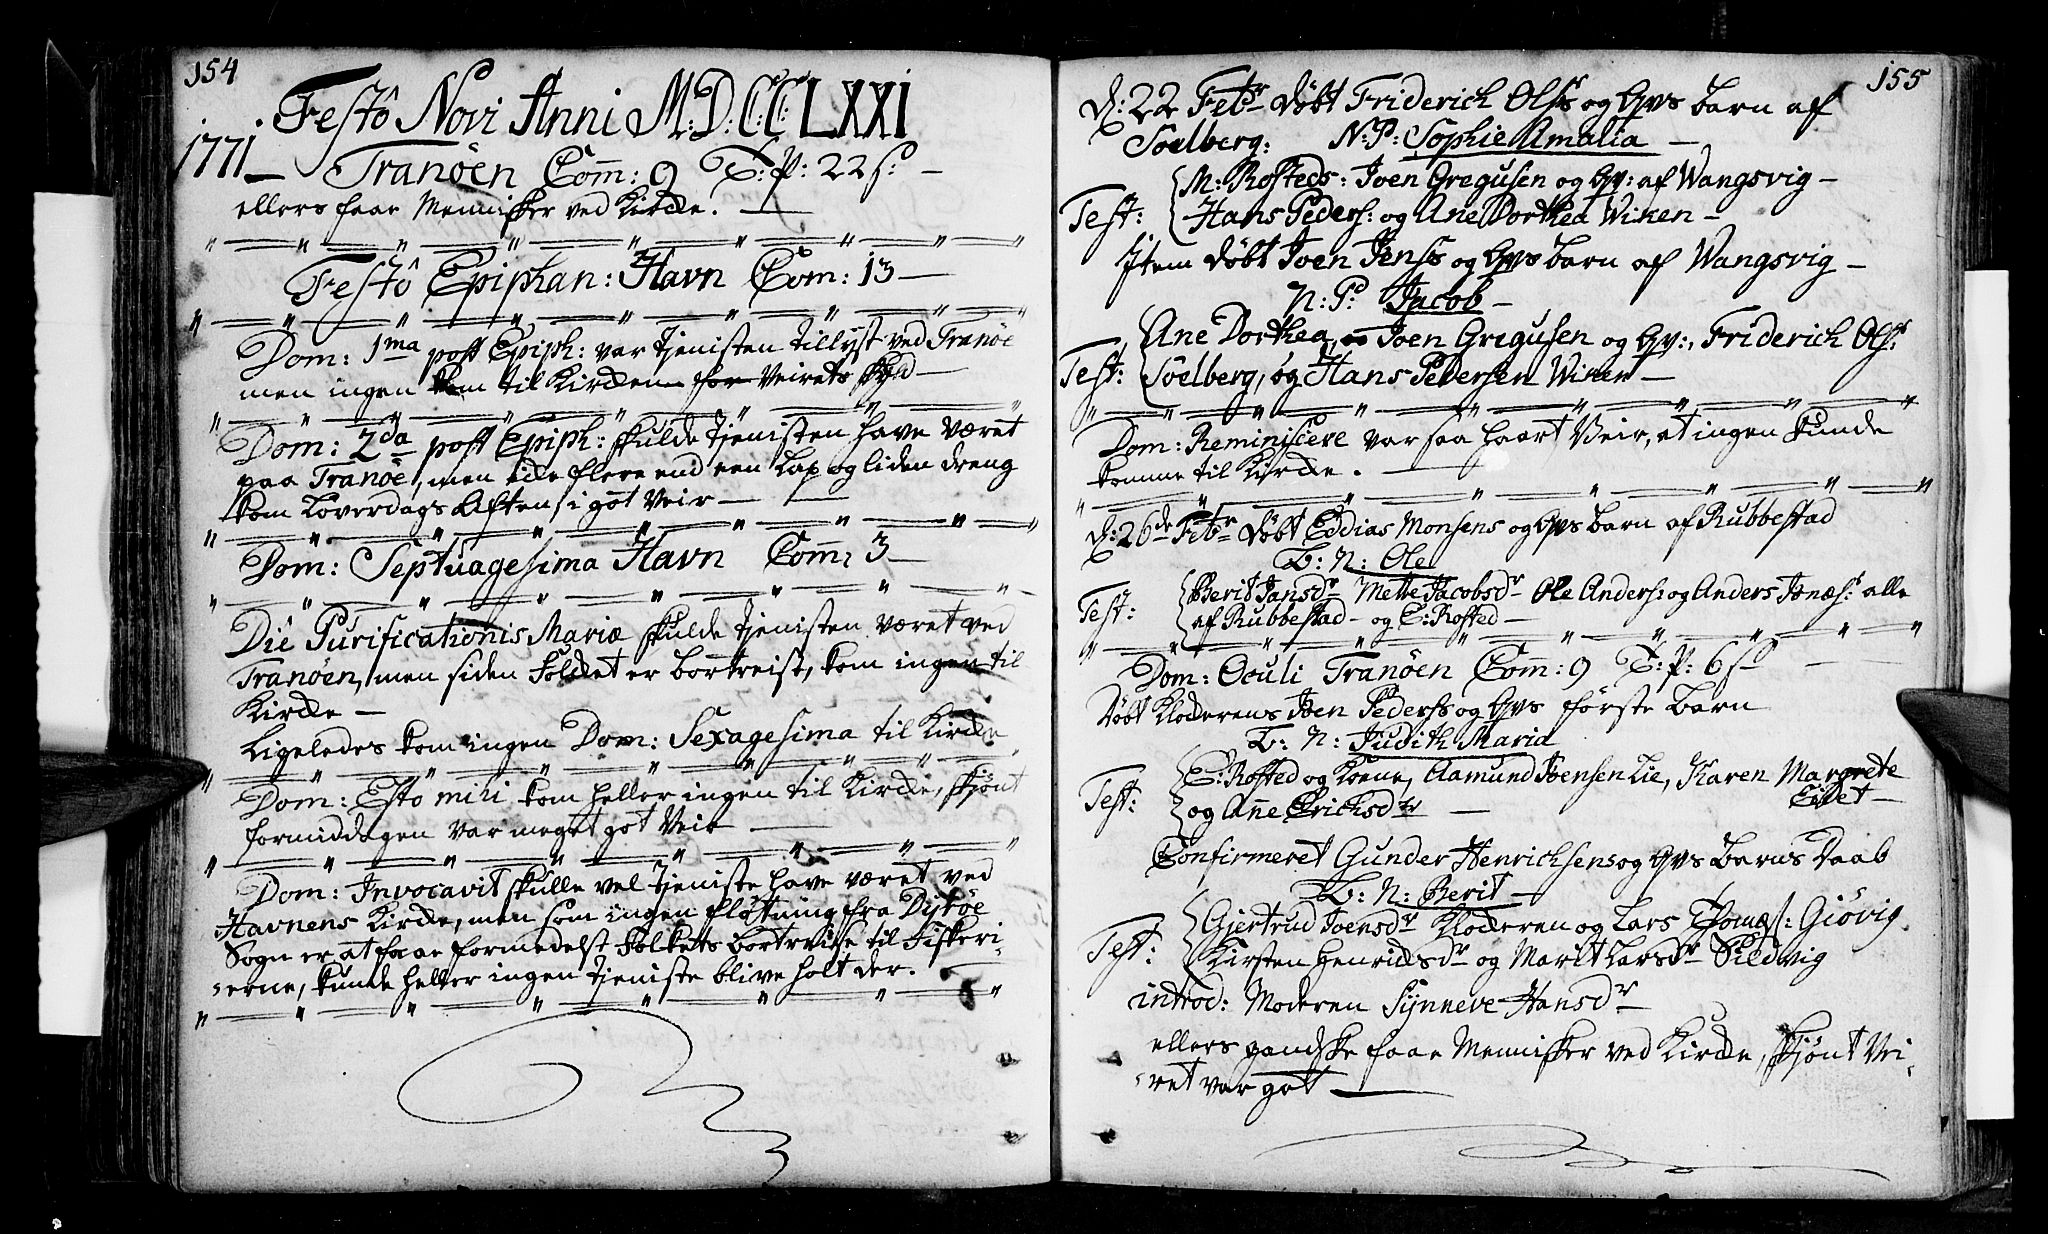 SATØ, Tranøy sokneprestkontor, I/Ia/Iaa/L0001kirke: Ministerialbok nr. 1, 1757-1773, s. 154-155